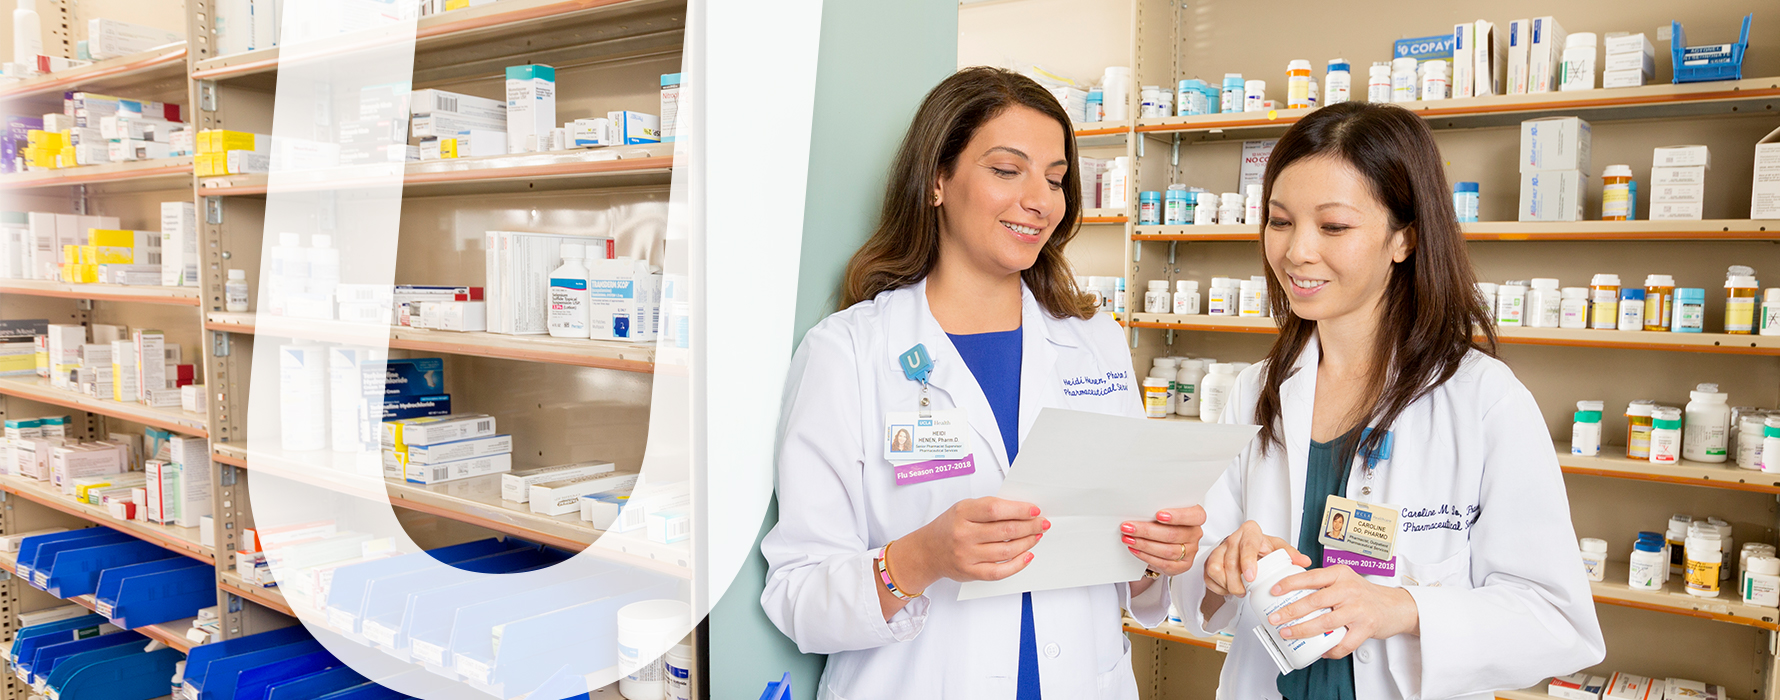 Allied Health Careers at UCLA Health